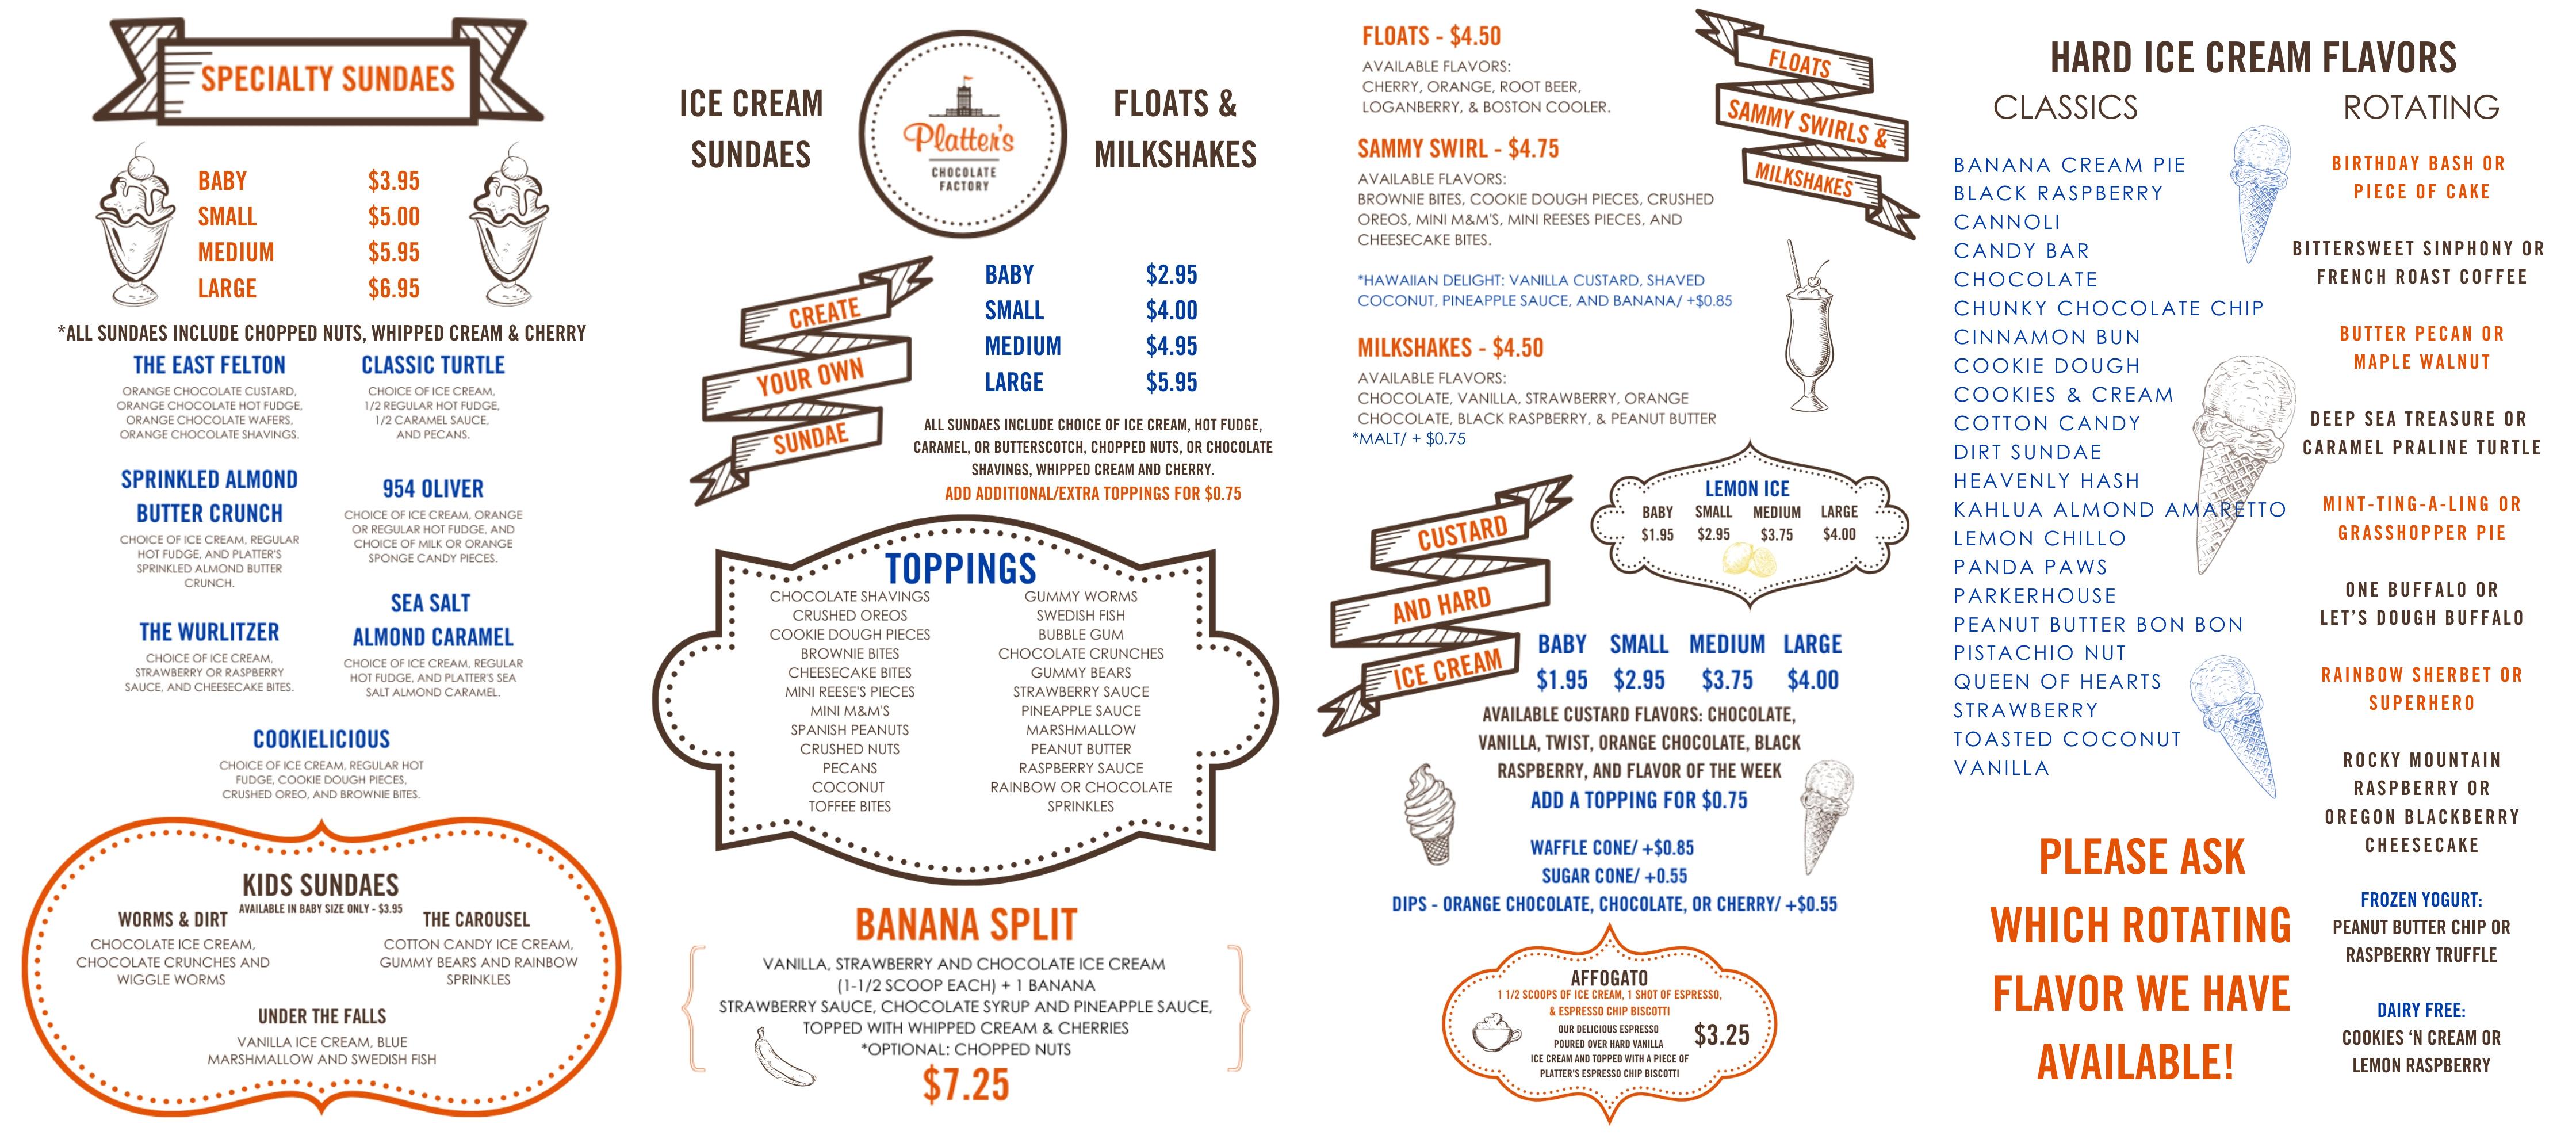 platter-s-cafe-ice-cream-menu.jpg